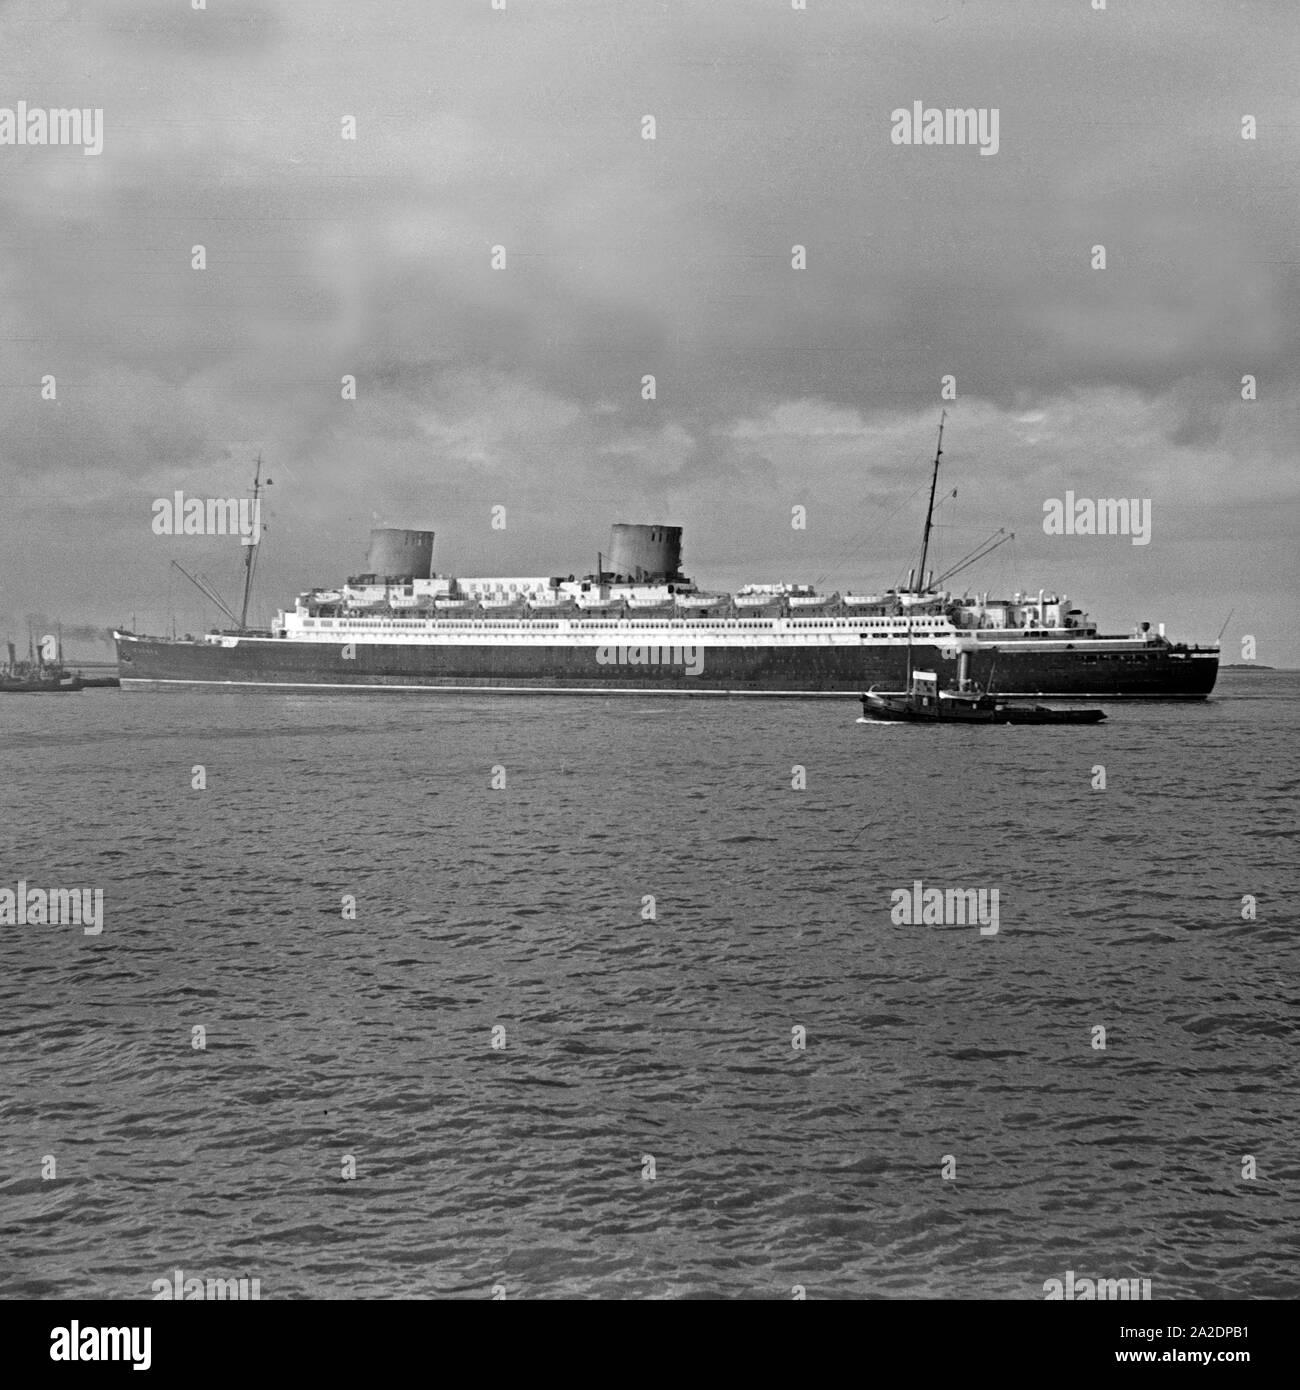 passenger ship vulcania 1930 - HD1300×1390